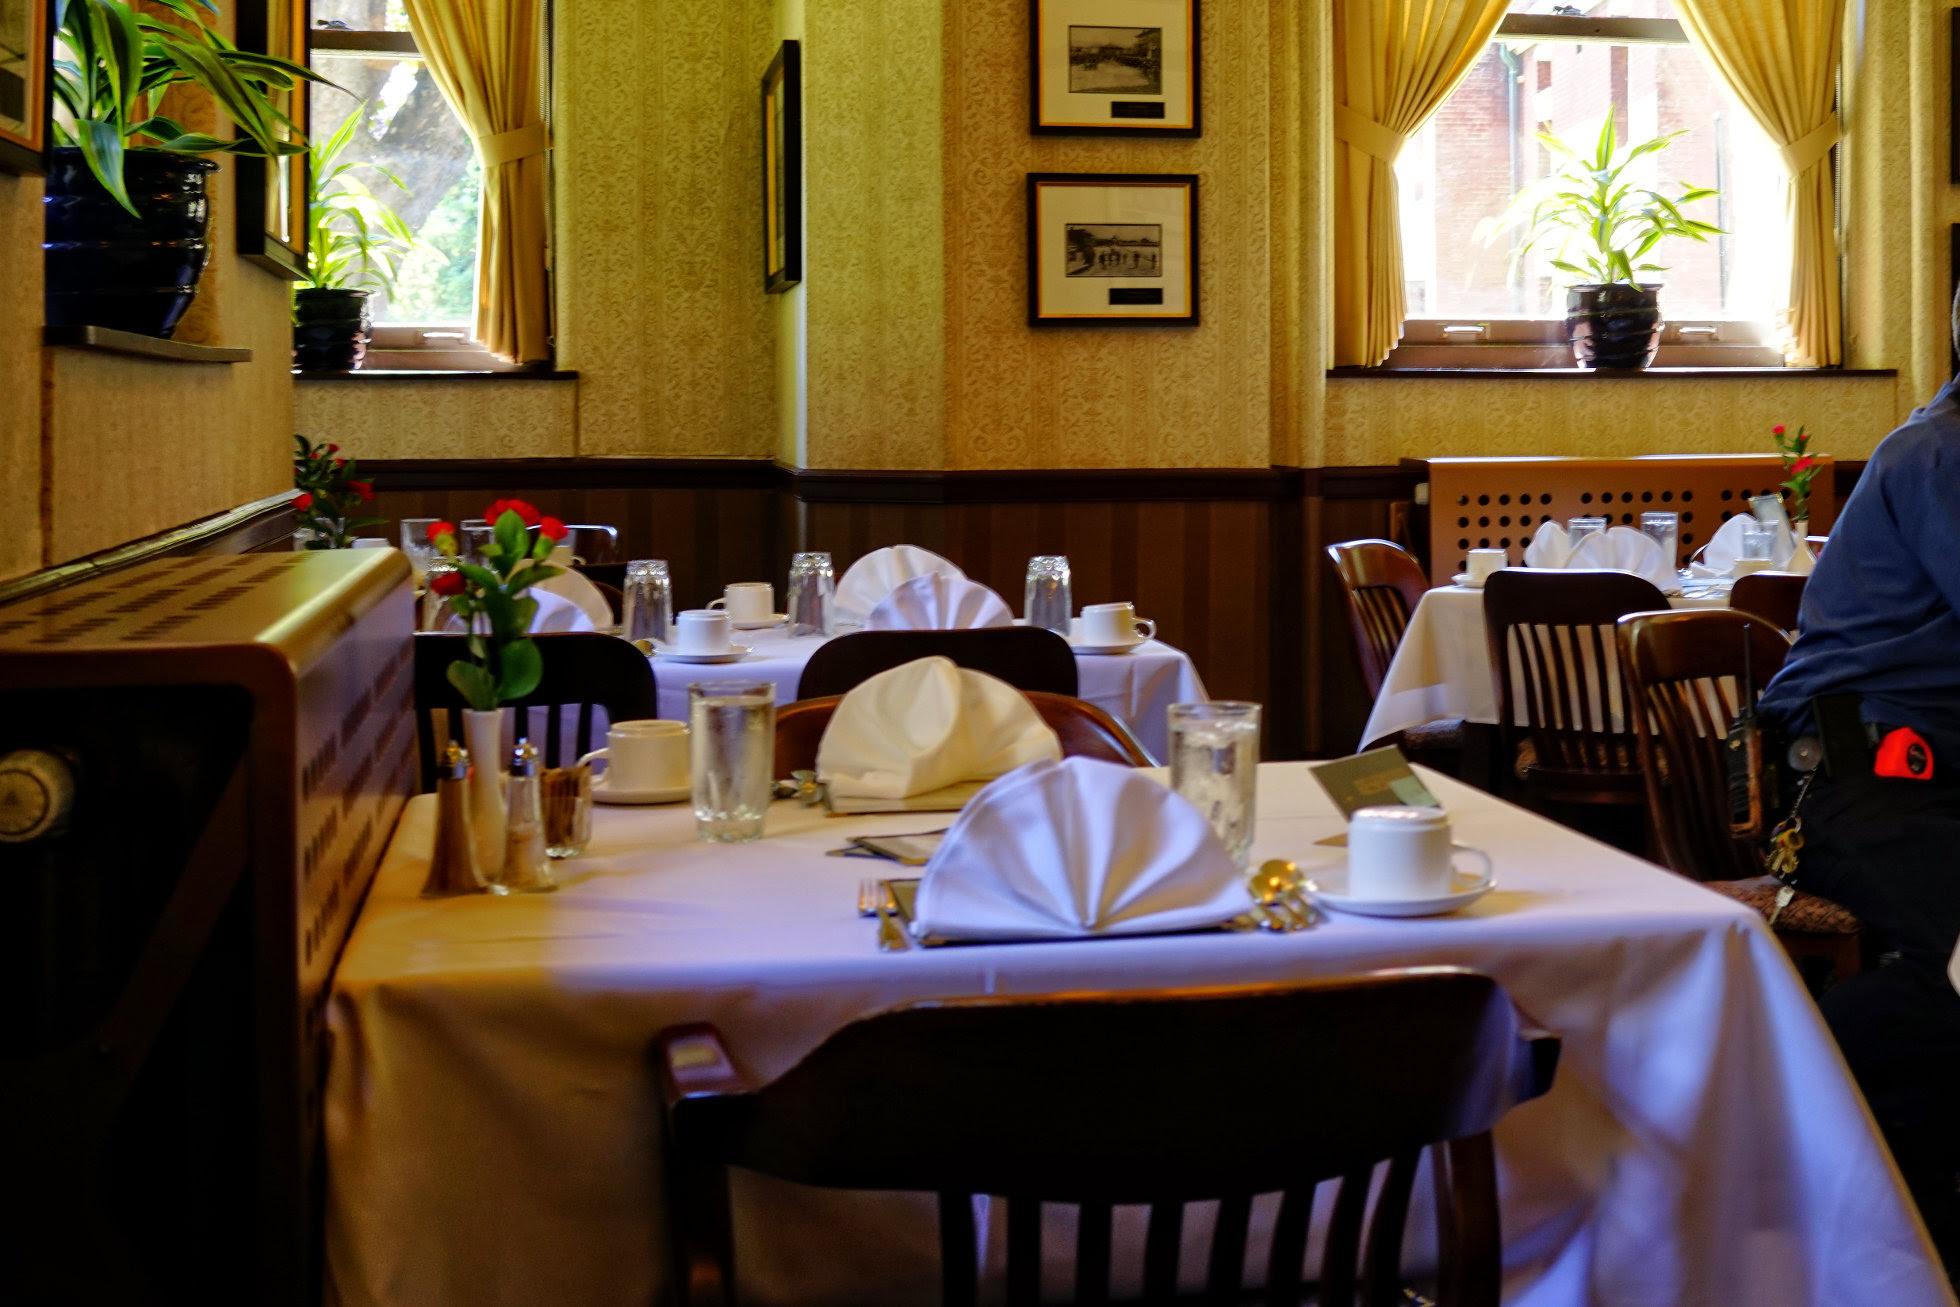 Bc Legislative Dining Room Menu